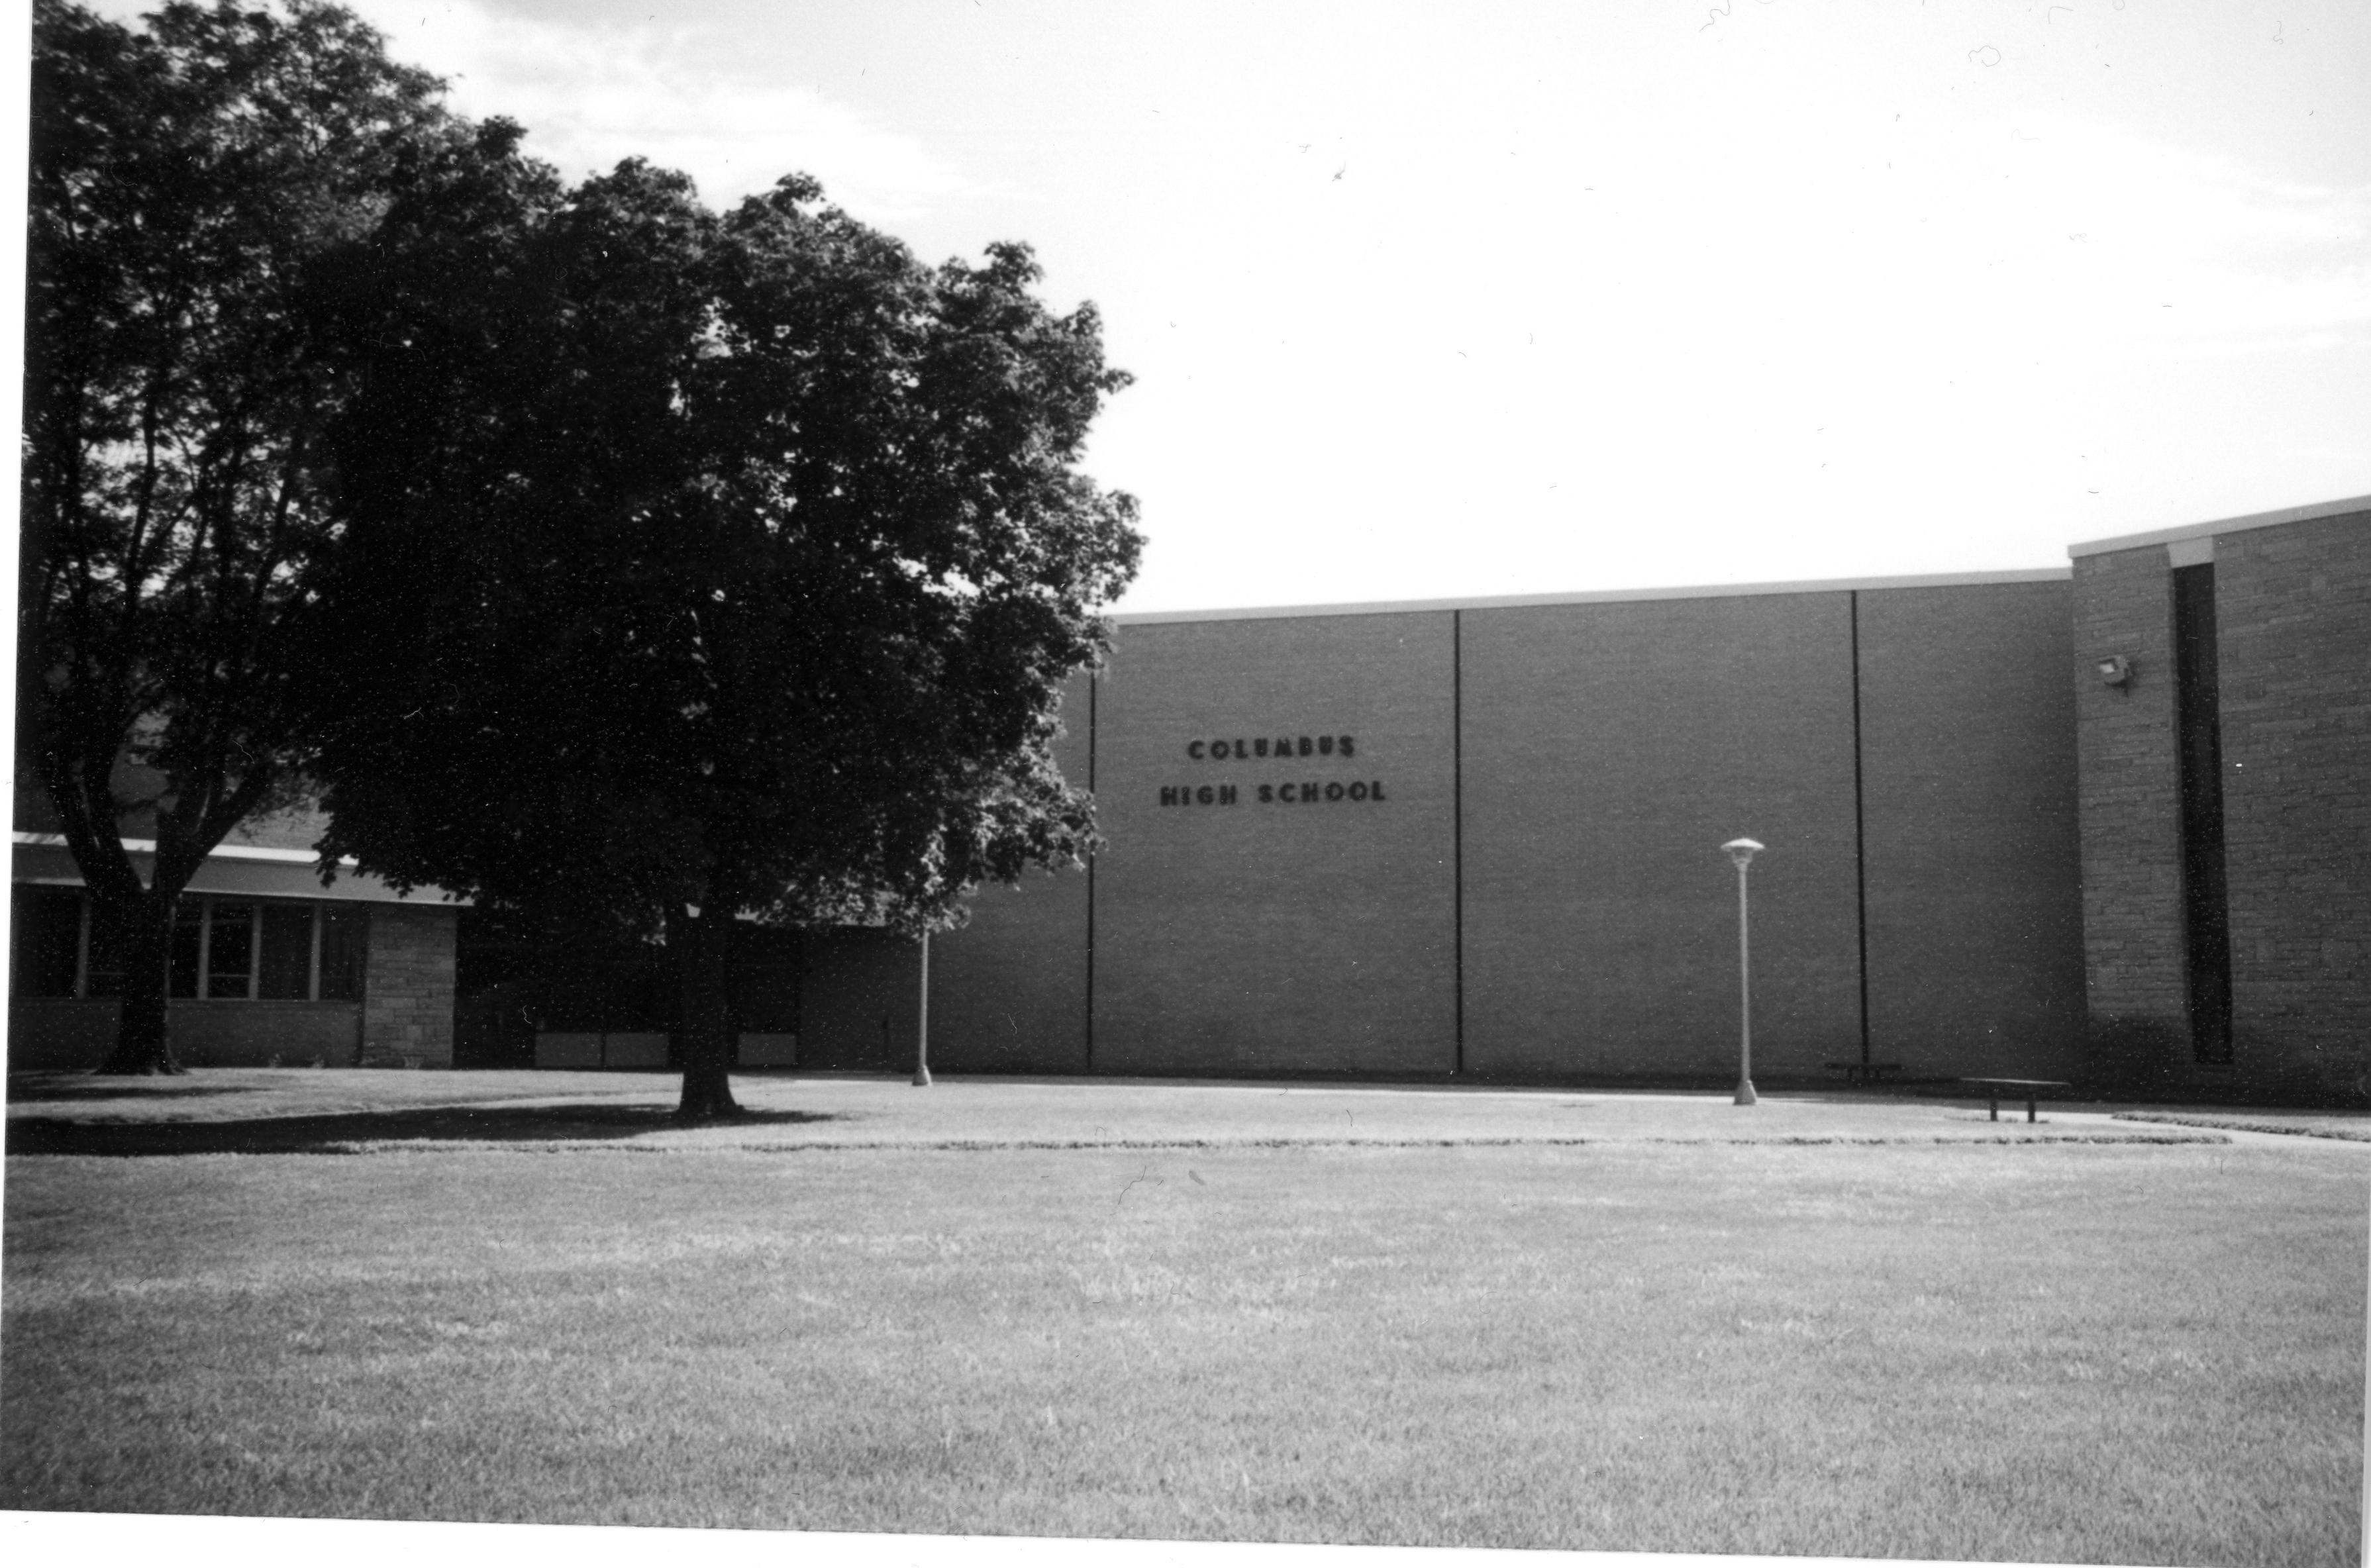 Columbus High School 1959 - 2004